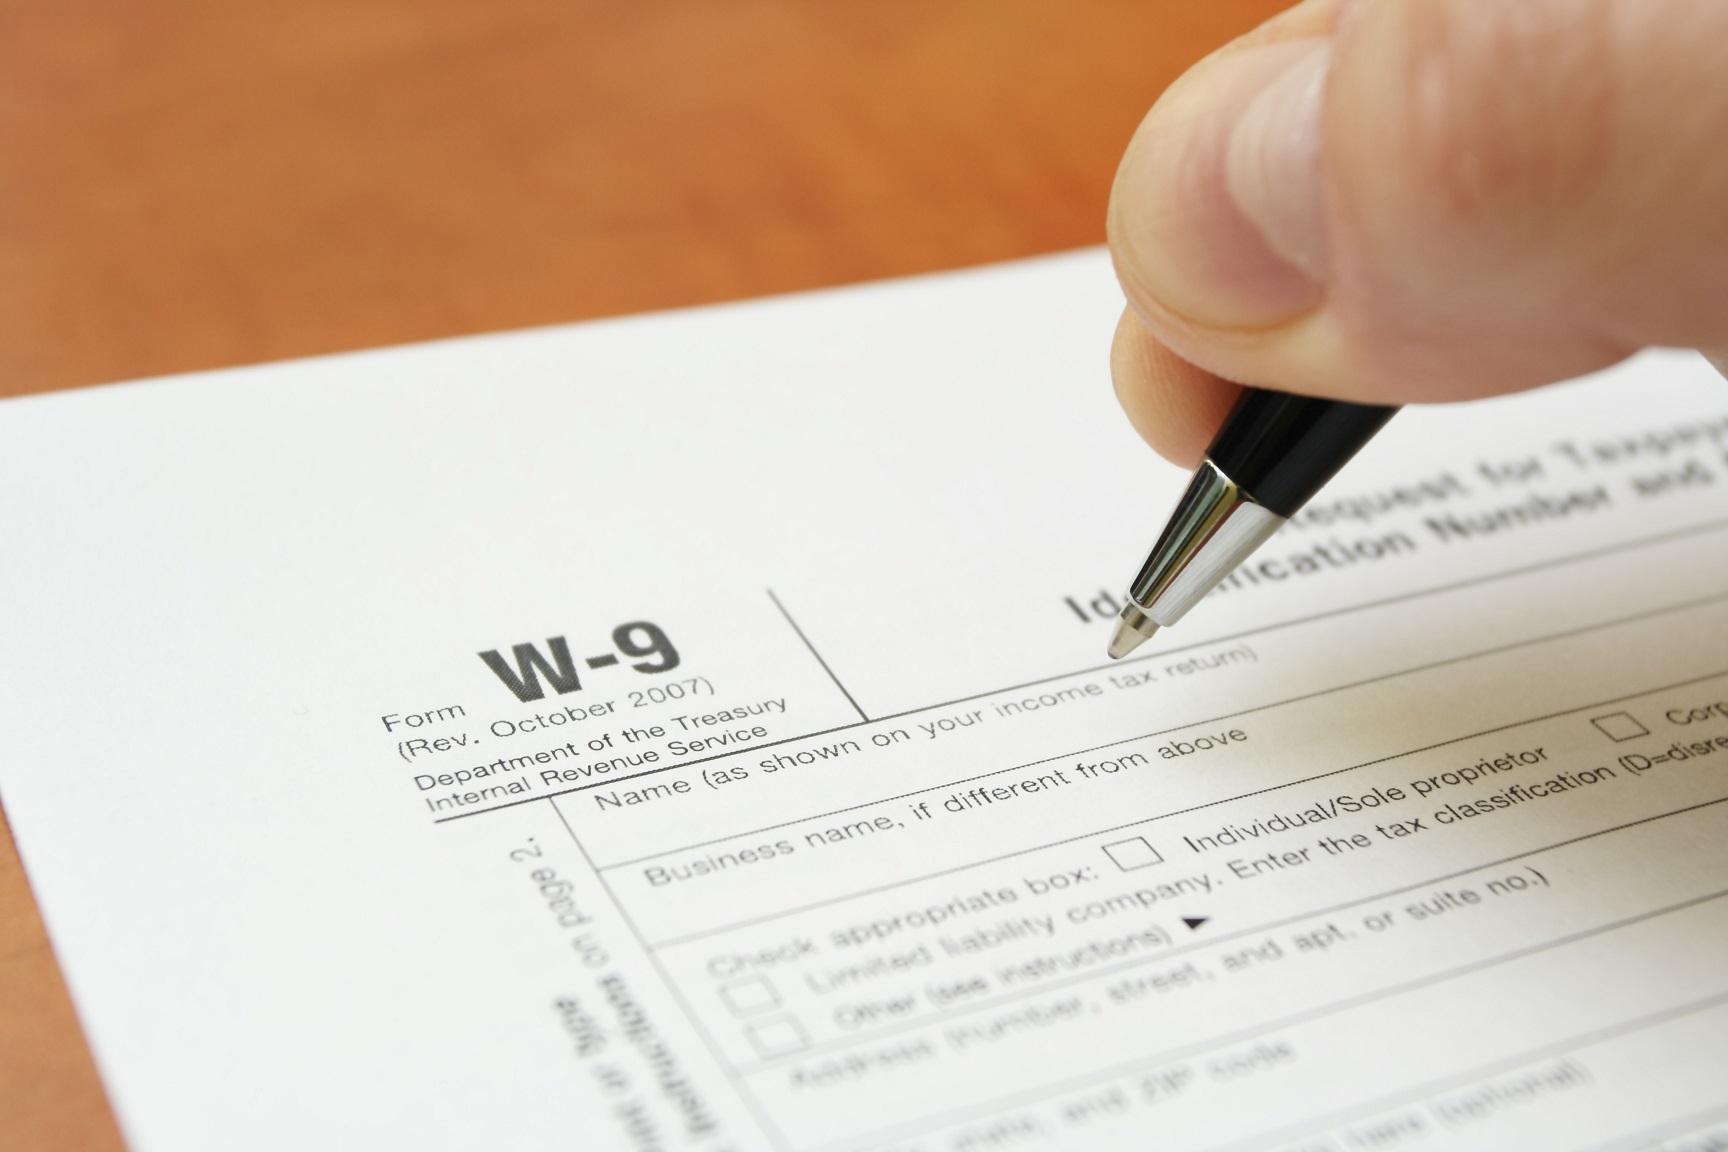 What Is A W-9 Tax Form? | H&R Block regarding Irs W9 Form 2021